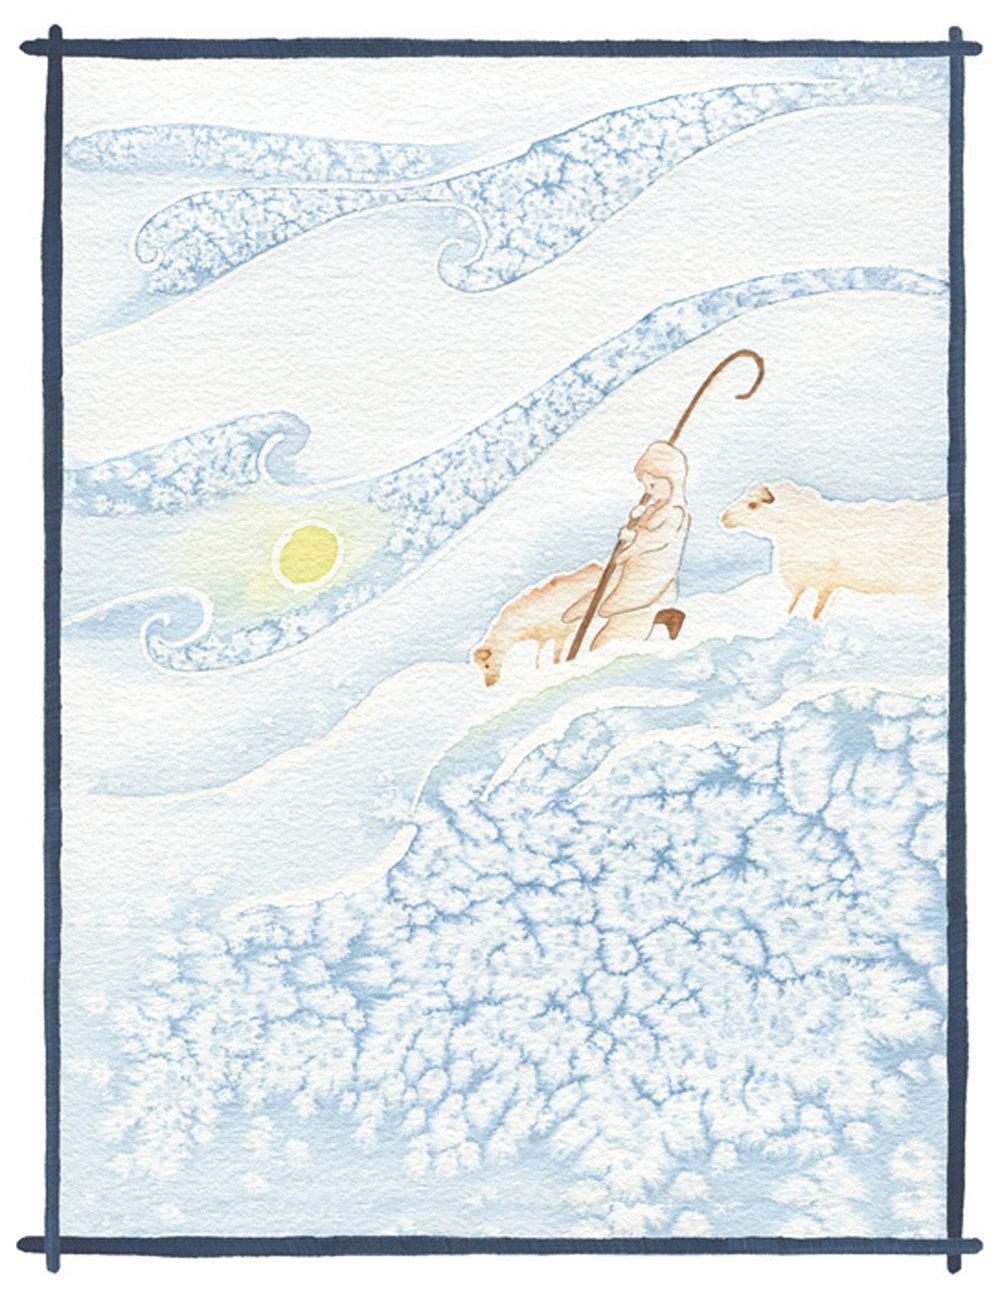 shepherd-boy-page-10 - Copy.jpg